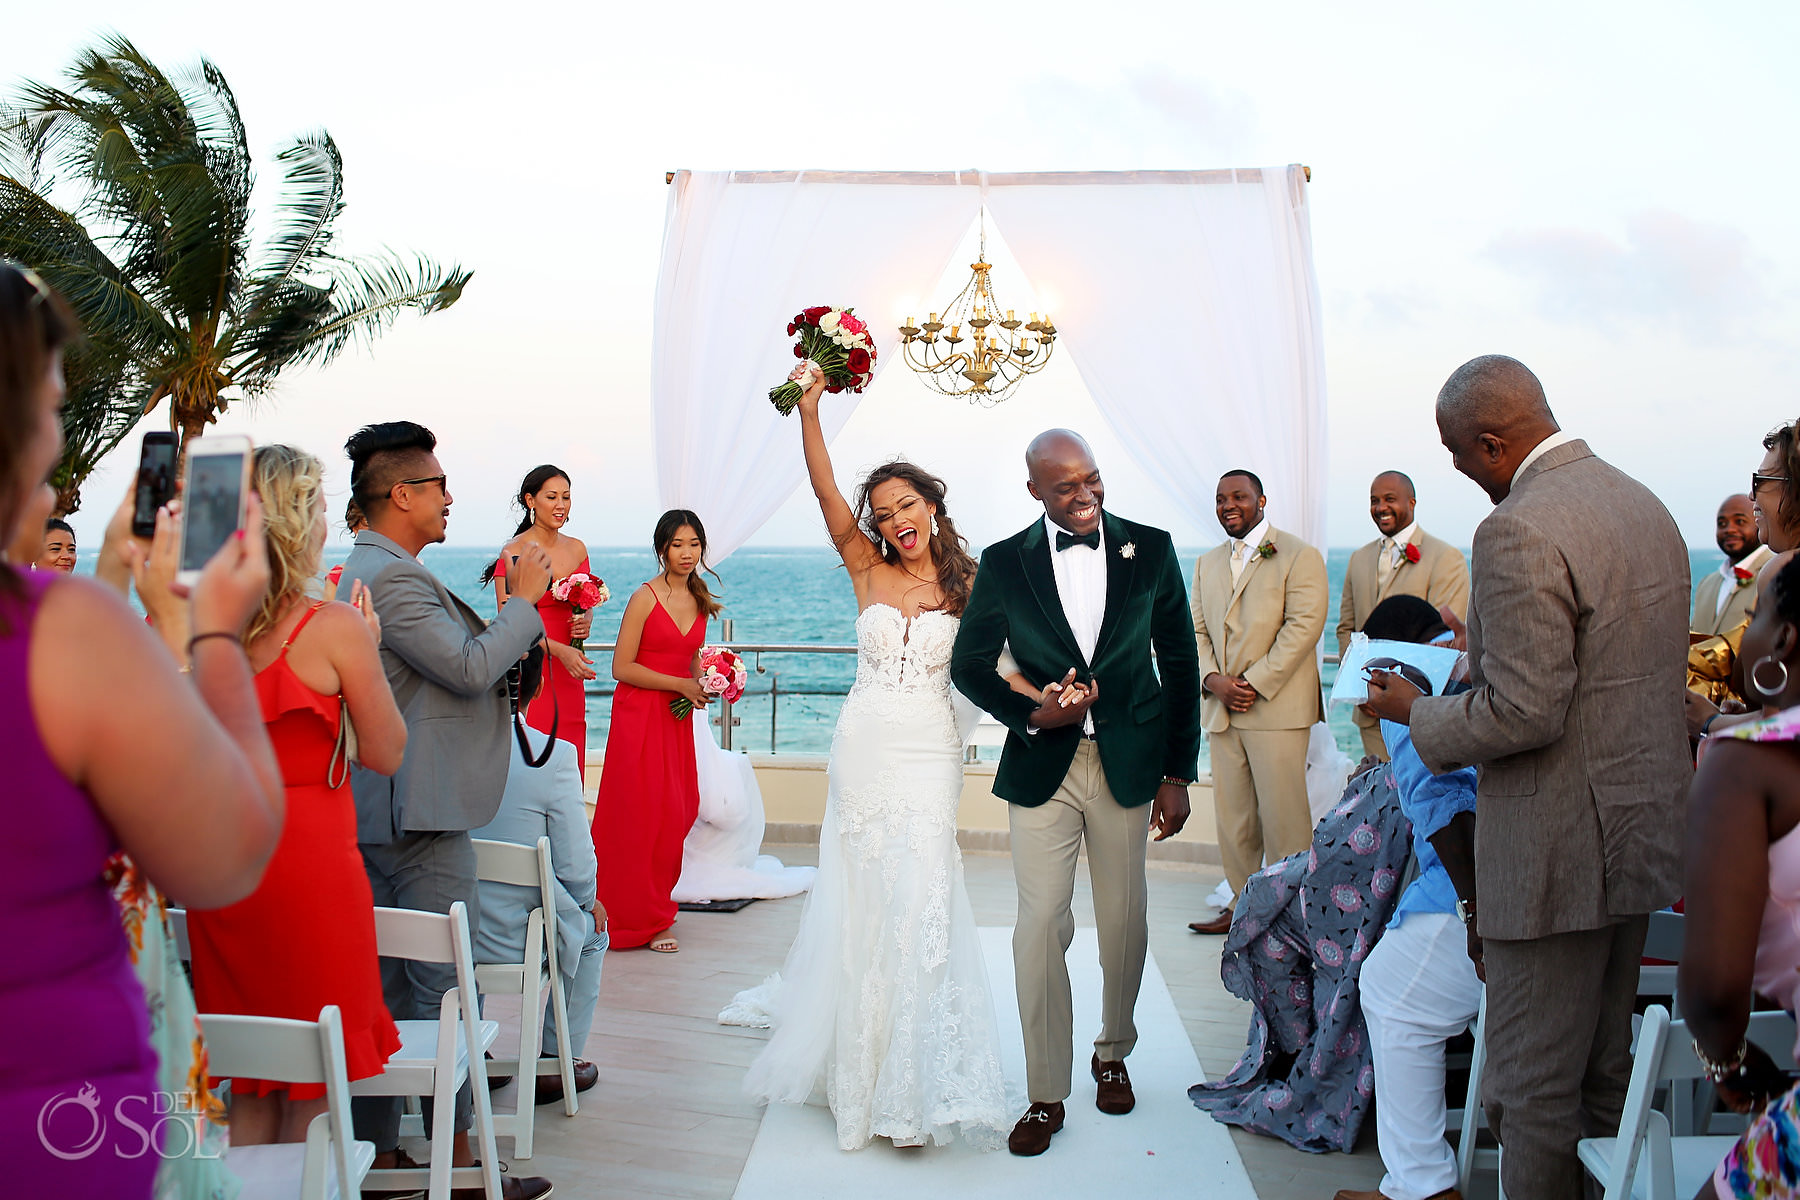 Dreams Riviera Cancun Oceana Rooftop Wedding photographs best riviera maya terrace locations